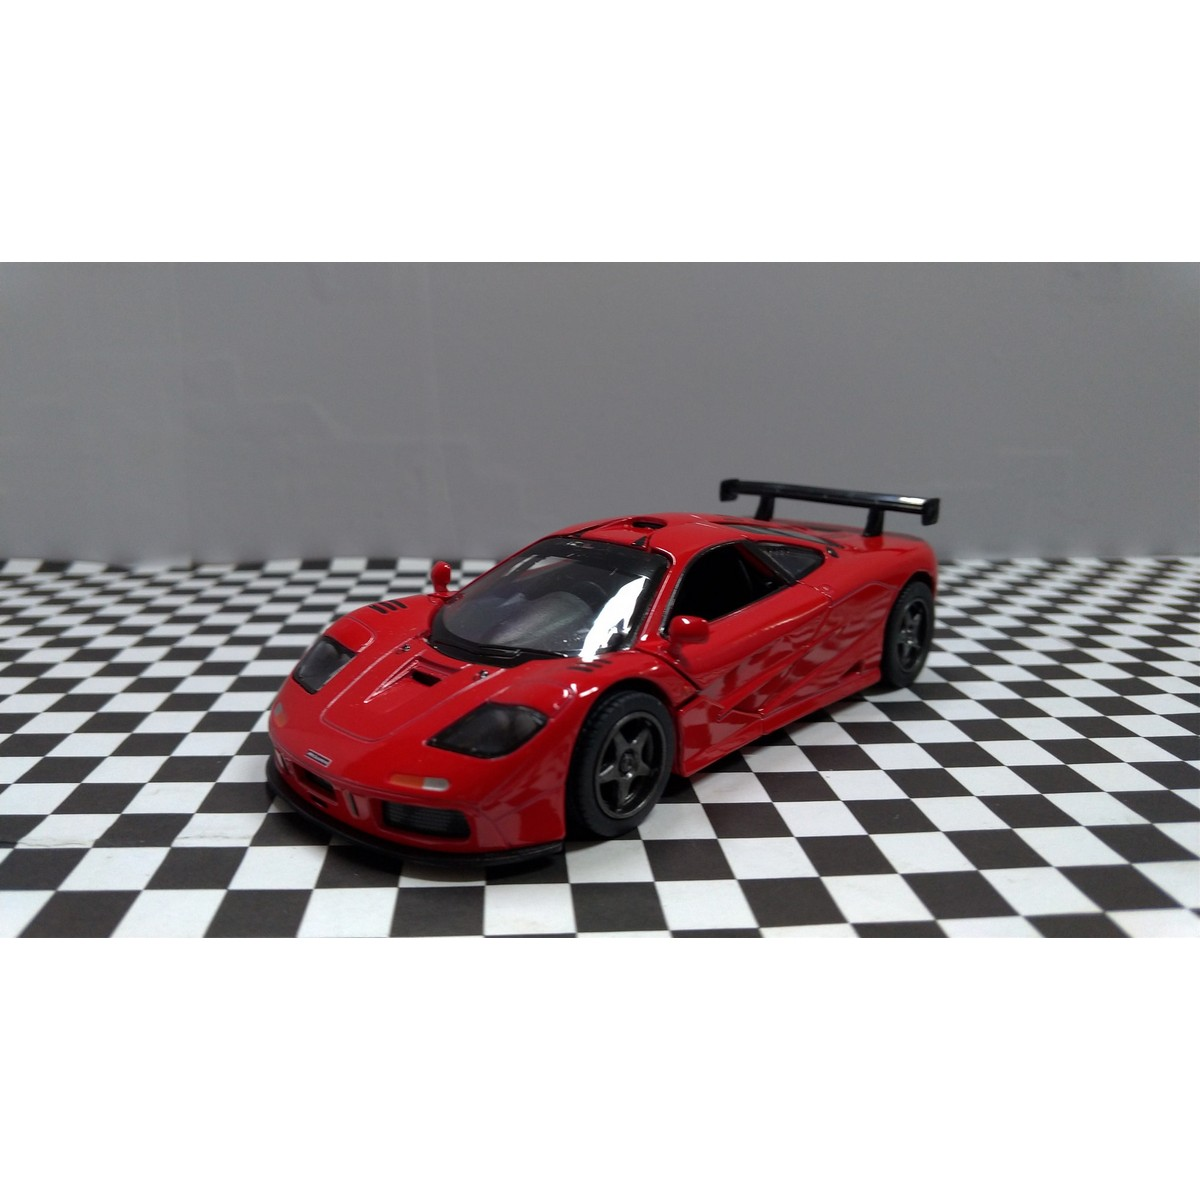 Kinsmart 1995 McLaren F1 GTR 1:34 Diecast Model Toy Car KT5411D- 5 inches